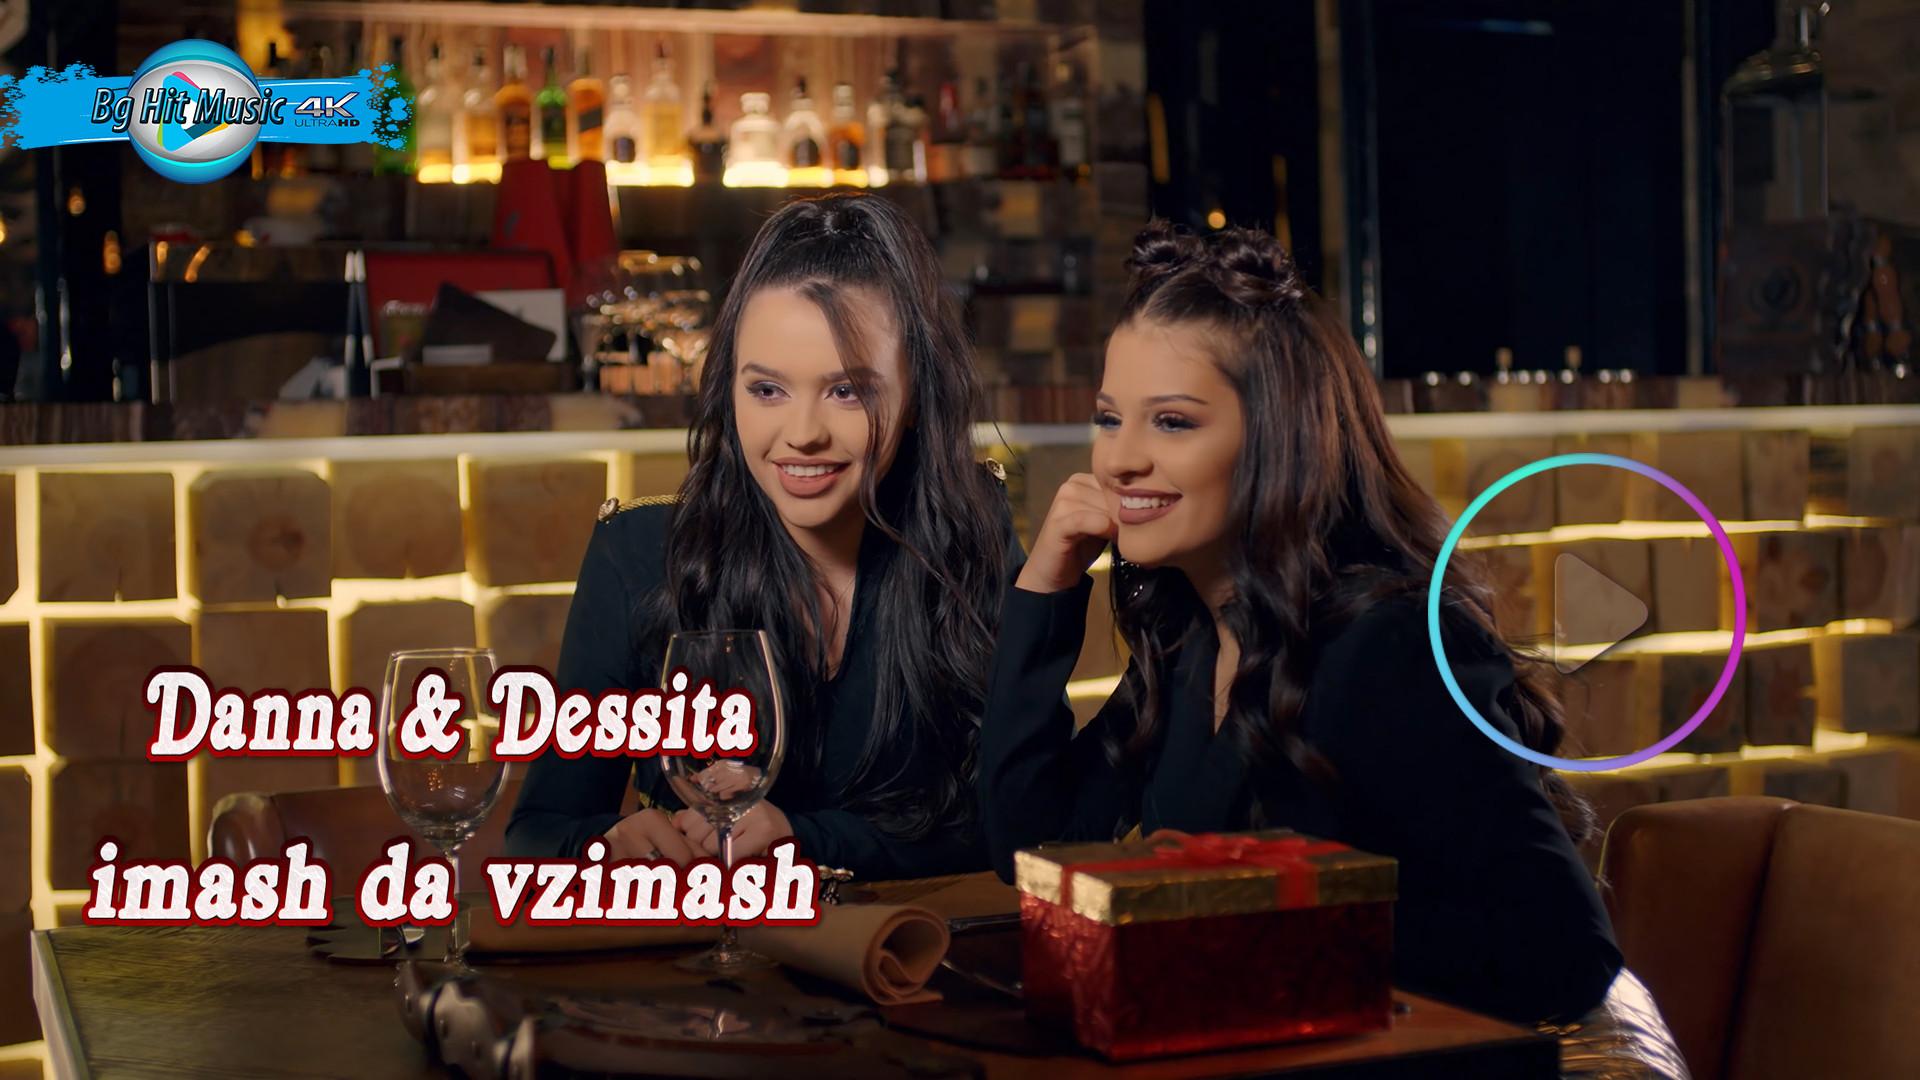 Danna & Dessita - imash da vzimash - Данна и Десита - Имаш да взимаш (Ultra HD 4K - 2020)